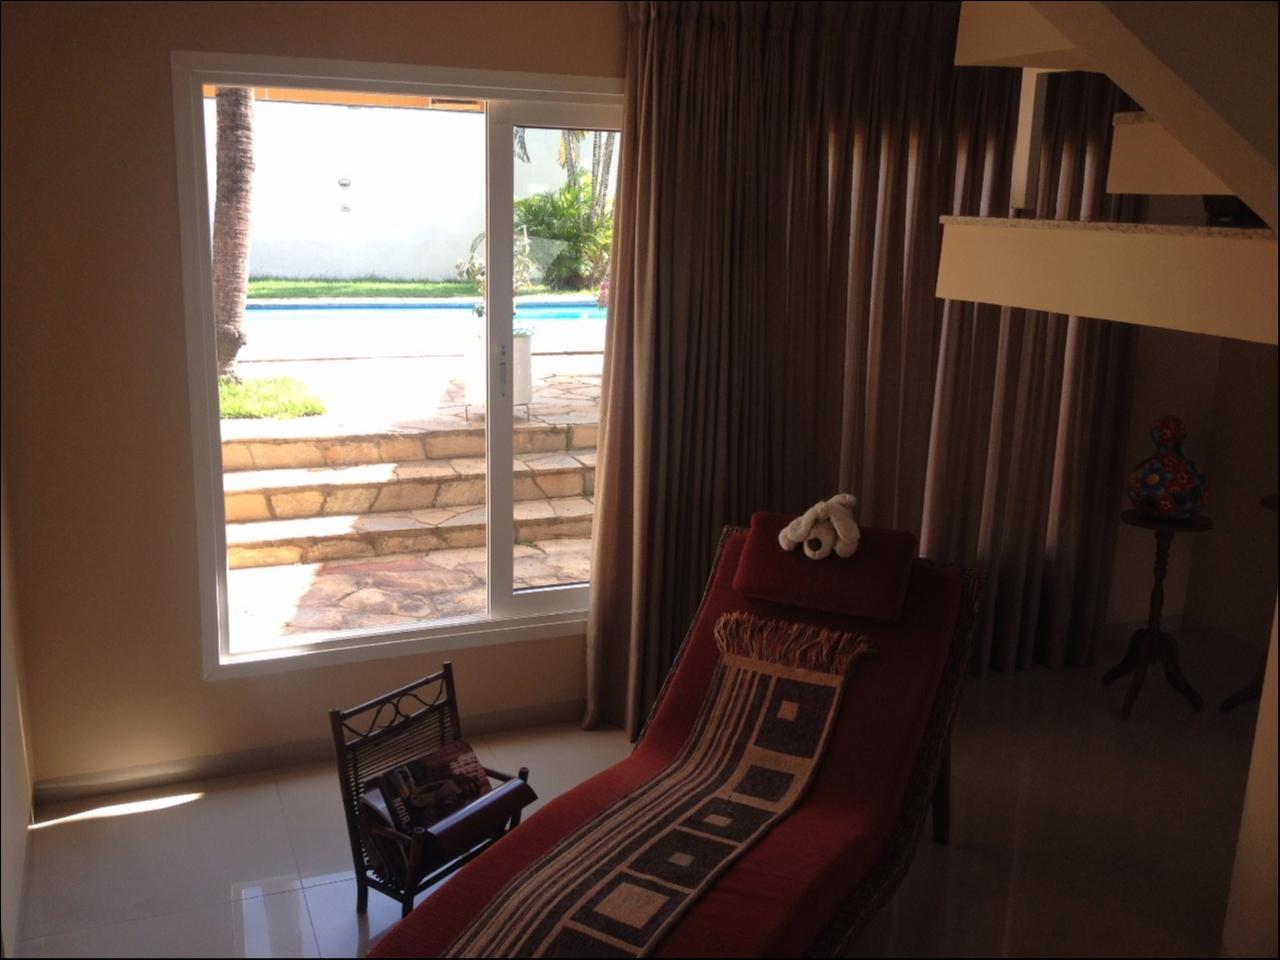 Casa  com 4 quartos sendo 3 Suítes no JD INDEPENDENCIA, Cuiabá  - MT